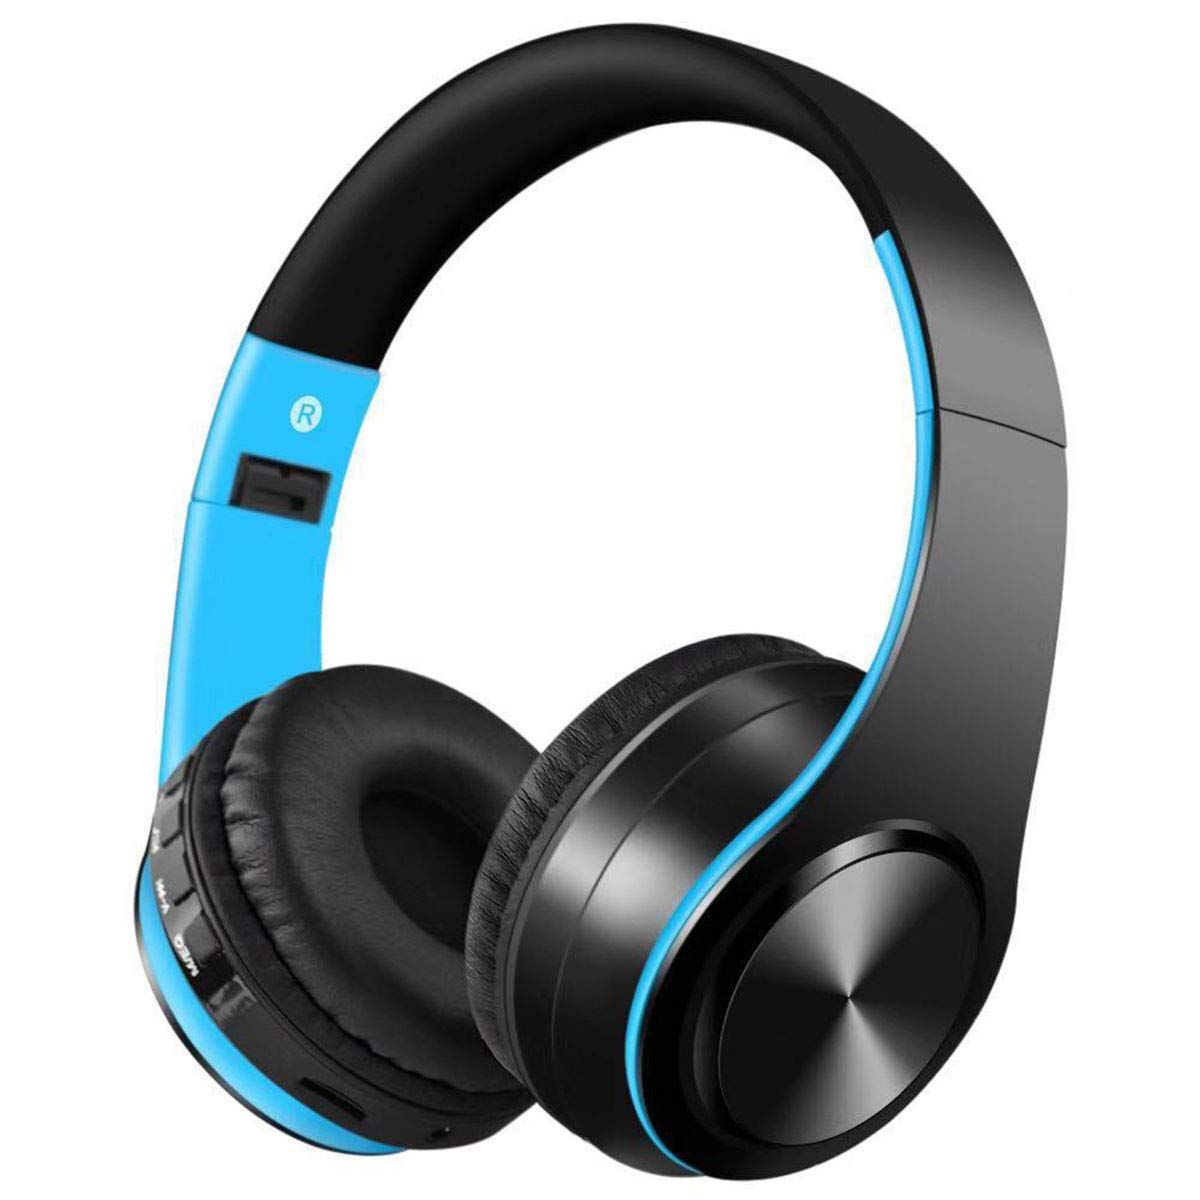 Yuehuam Wireless BT Headphone Foldable Over Ear Stereo Earphone Super Bass Headset Around Ear Bluetooth Wireless Headphones- Black + Blue